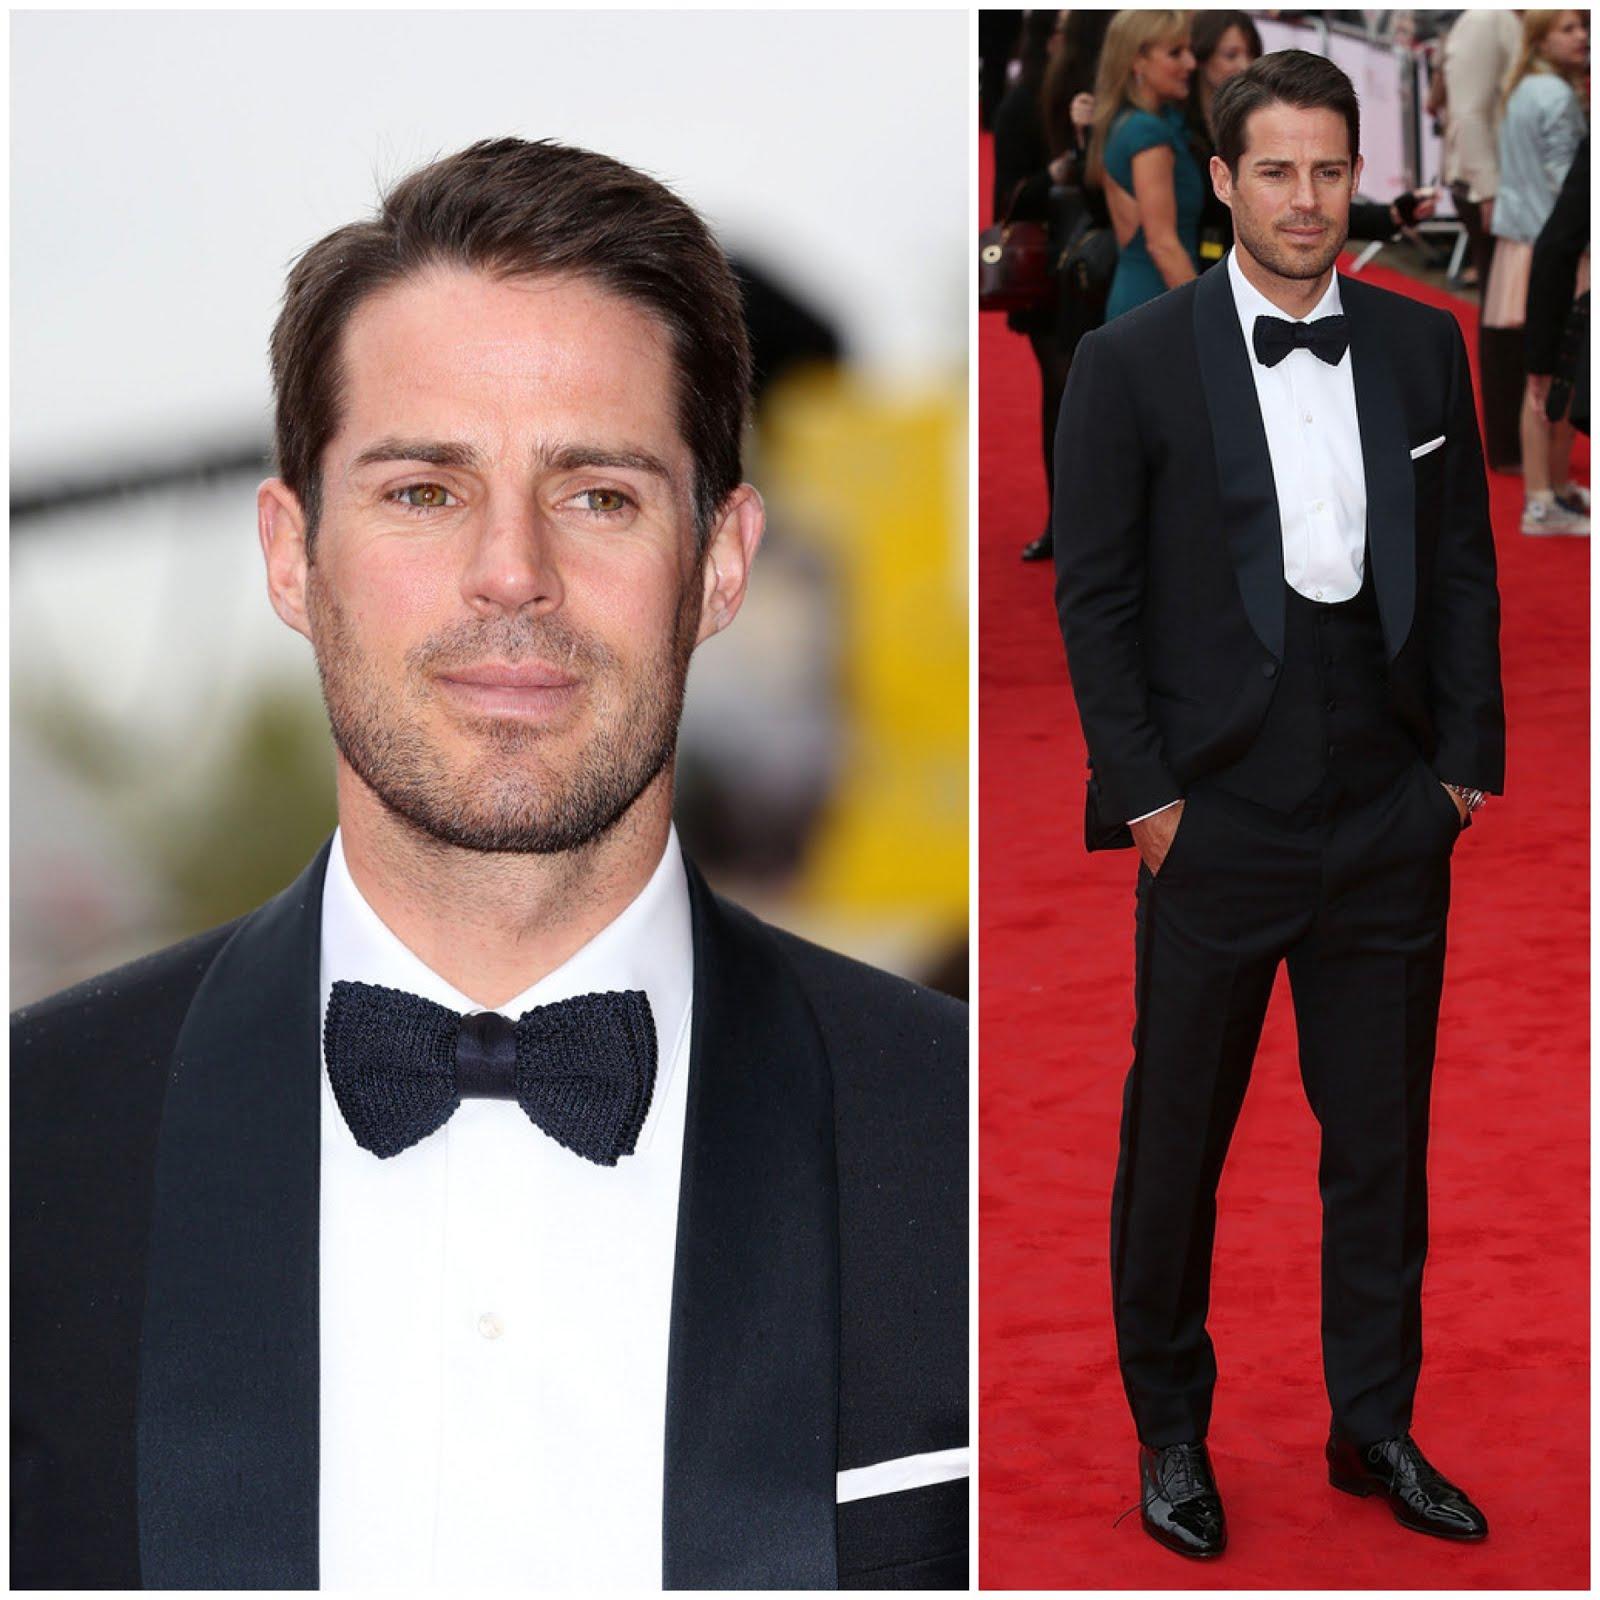 00O00 Menswear Blog: Jamie Redknapp in Thom Sweeney bespoke 3 piece suit - 2013 BAFTA Awards London